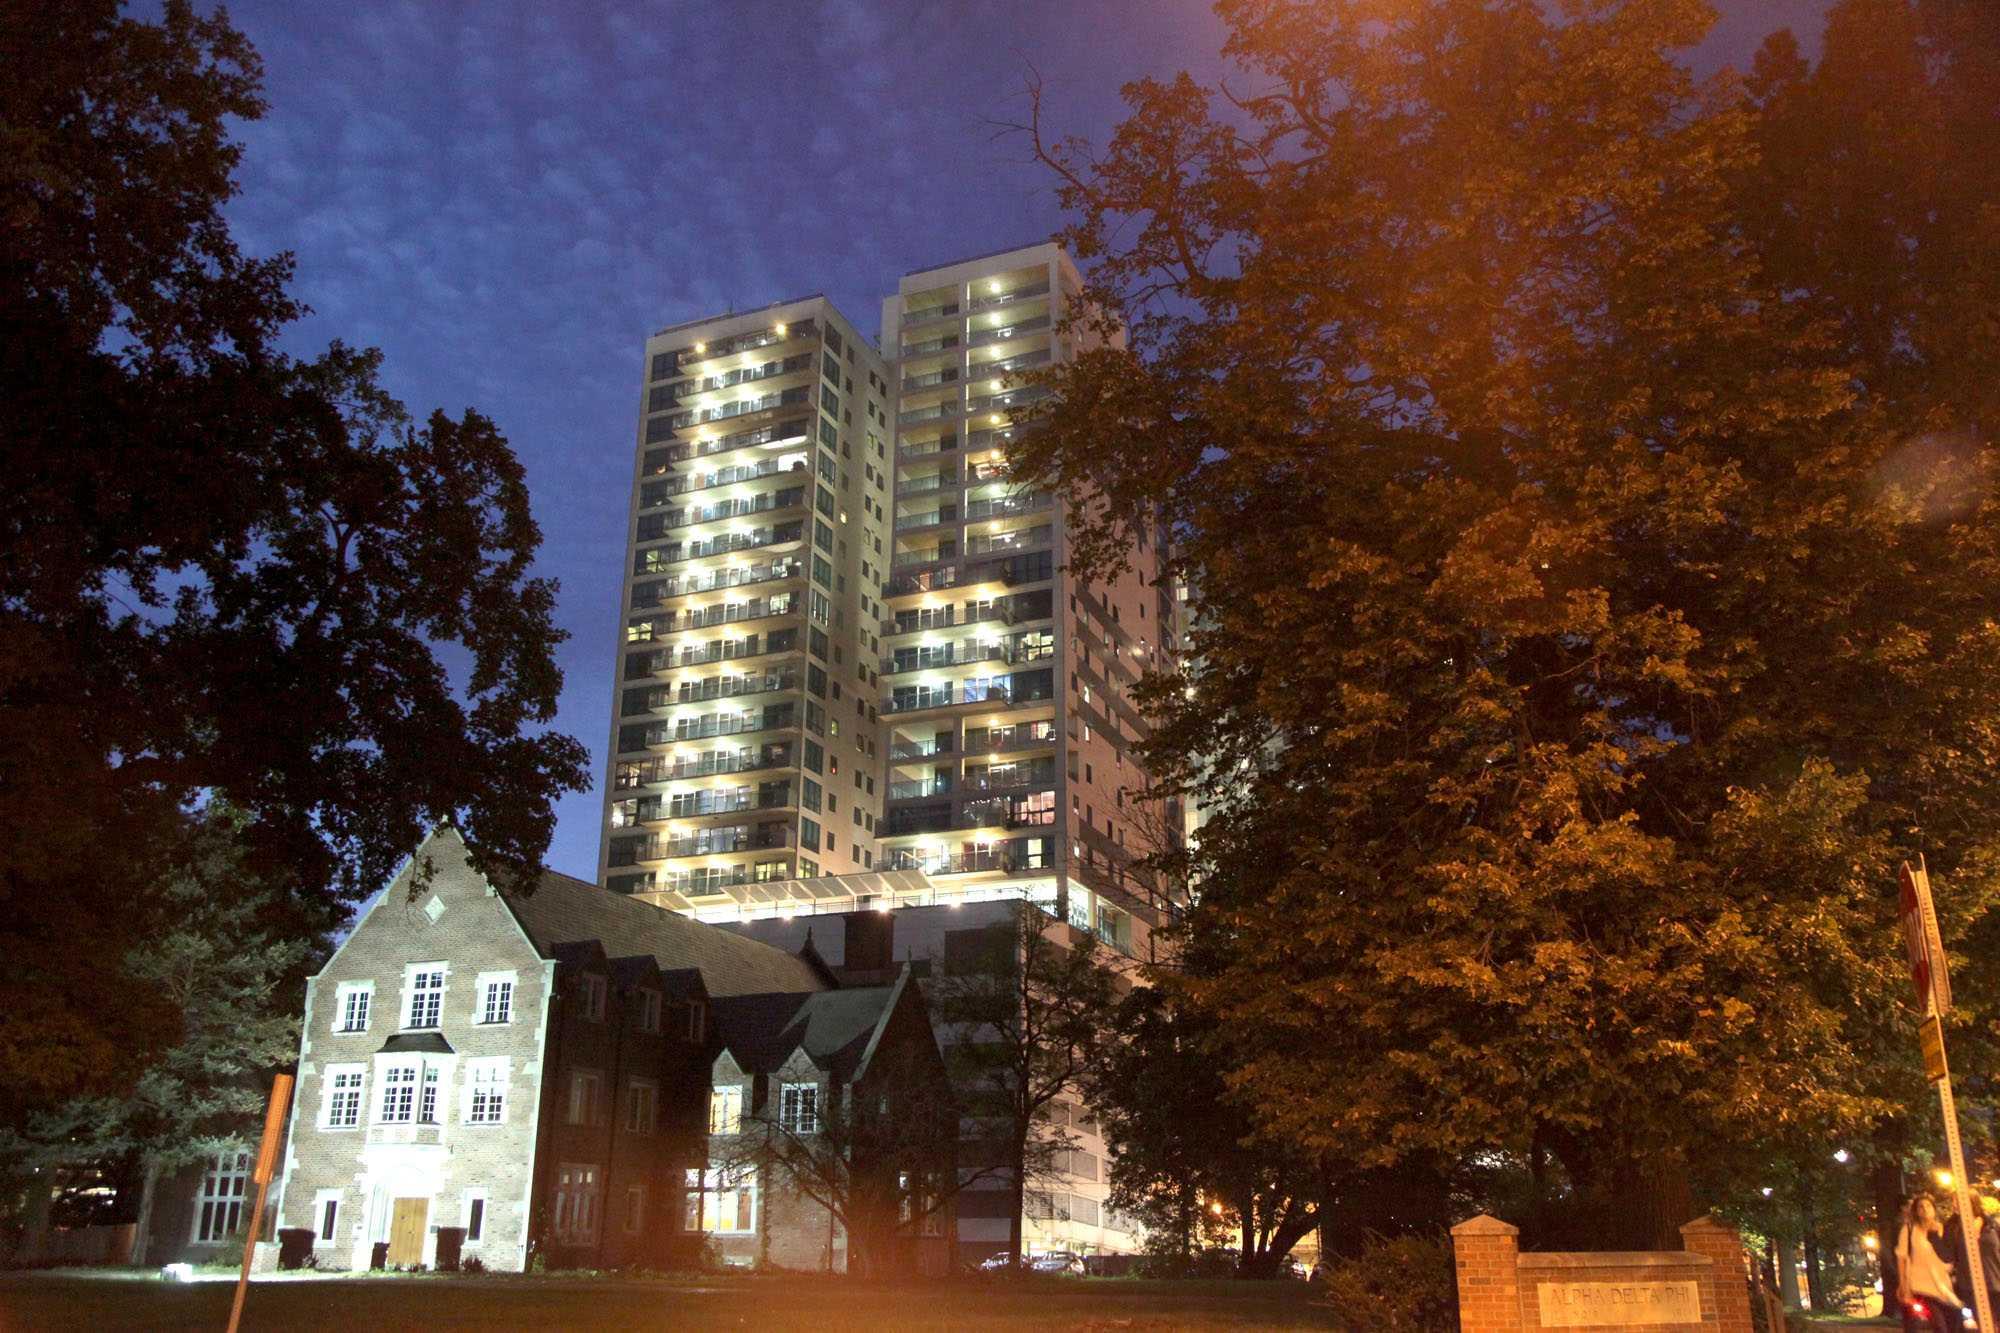 Luxury Housing on UIUC campus at around 7:30 pm. Taken October 5, 2015.